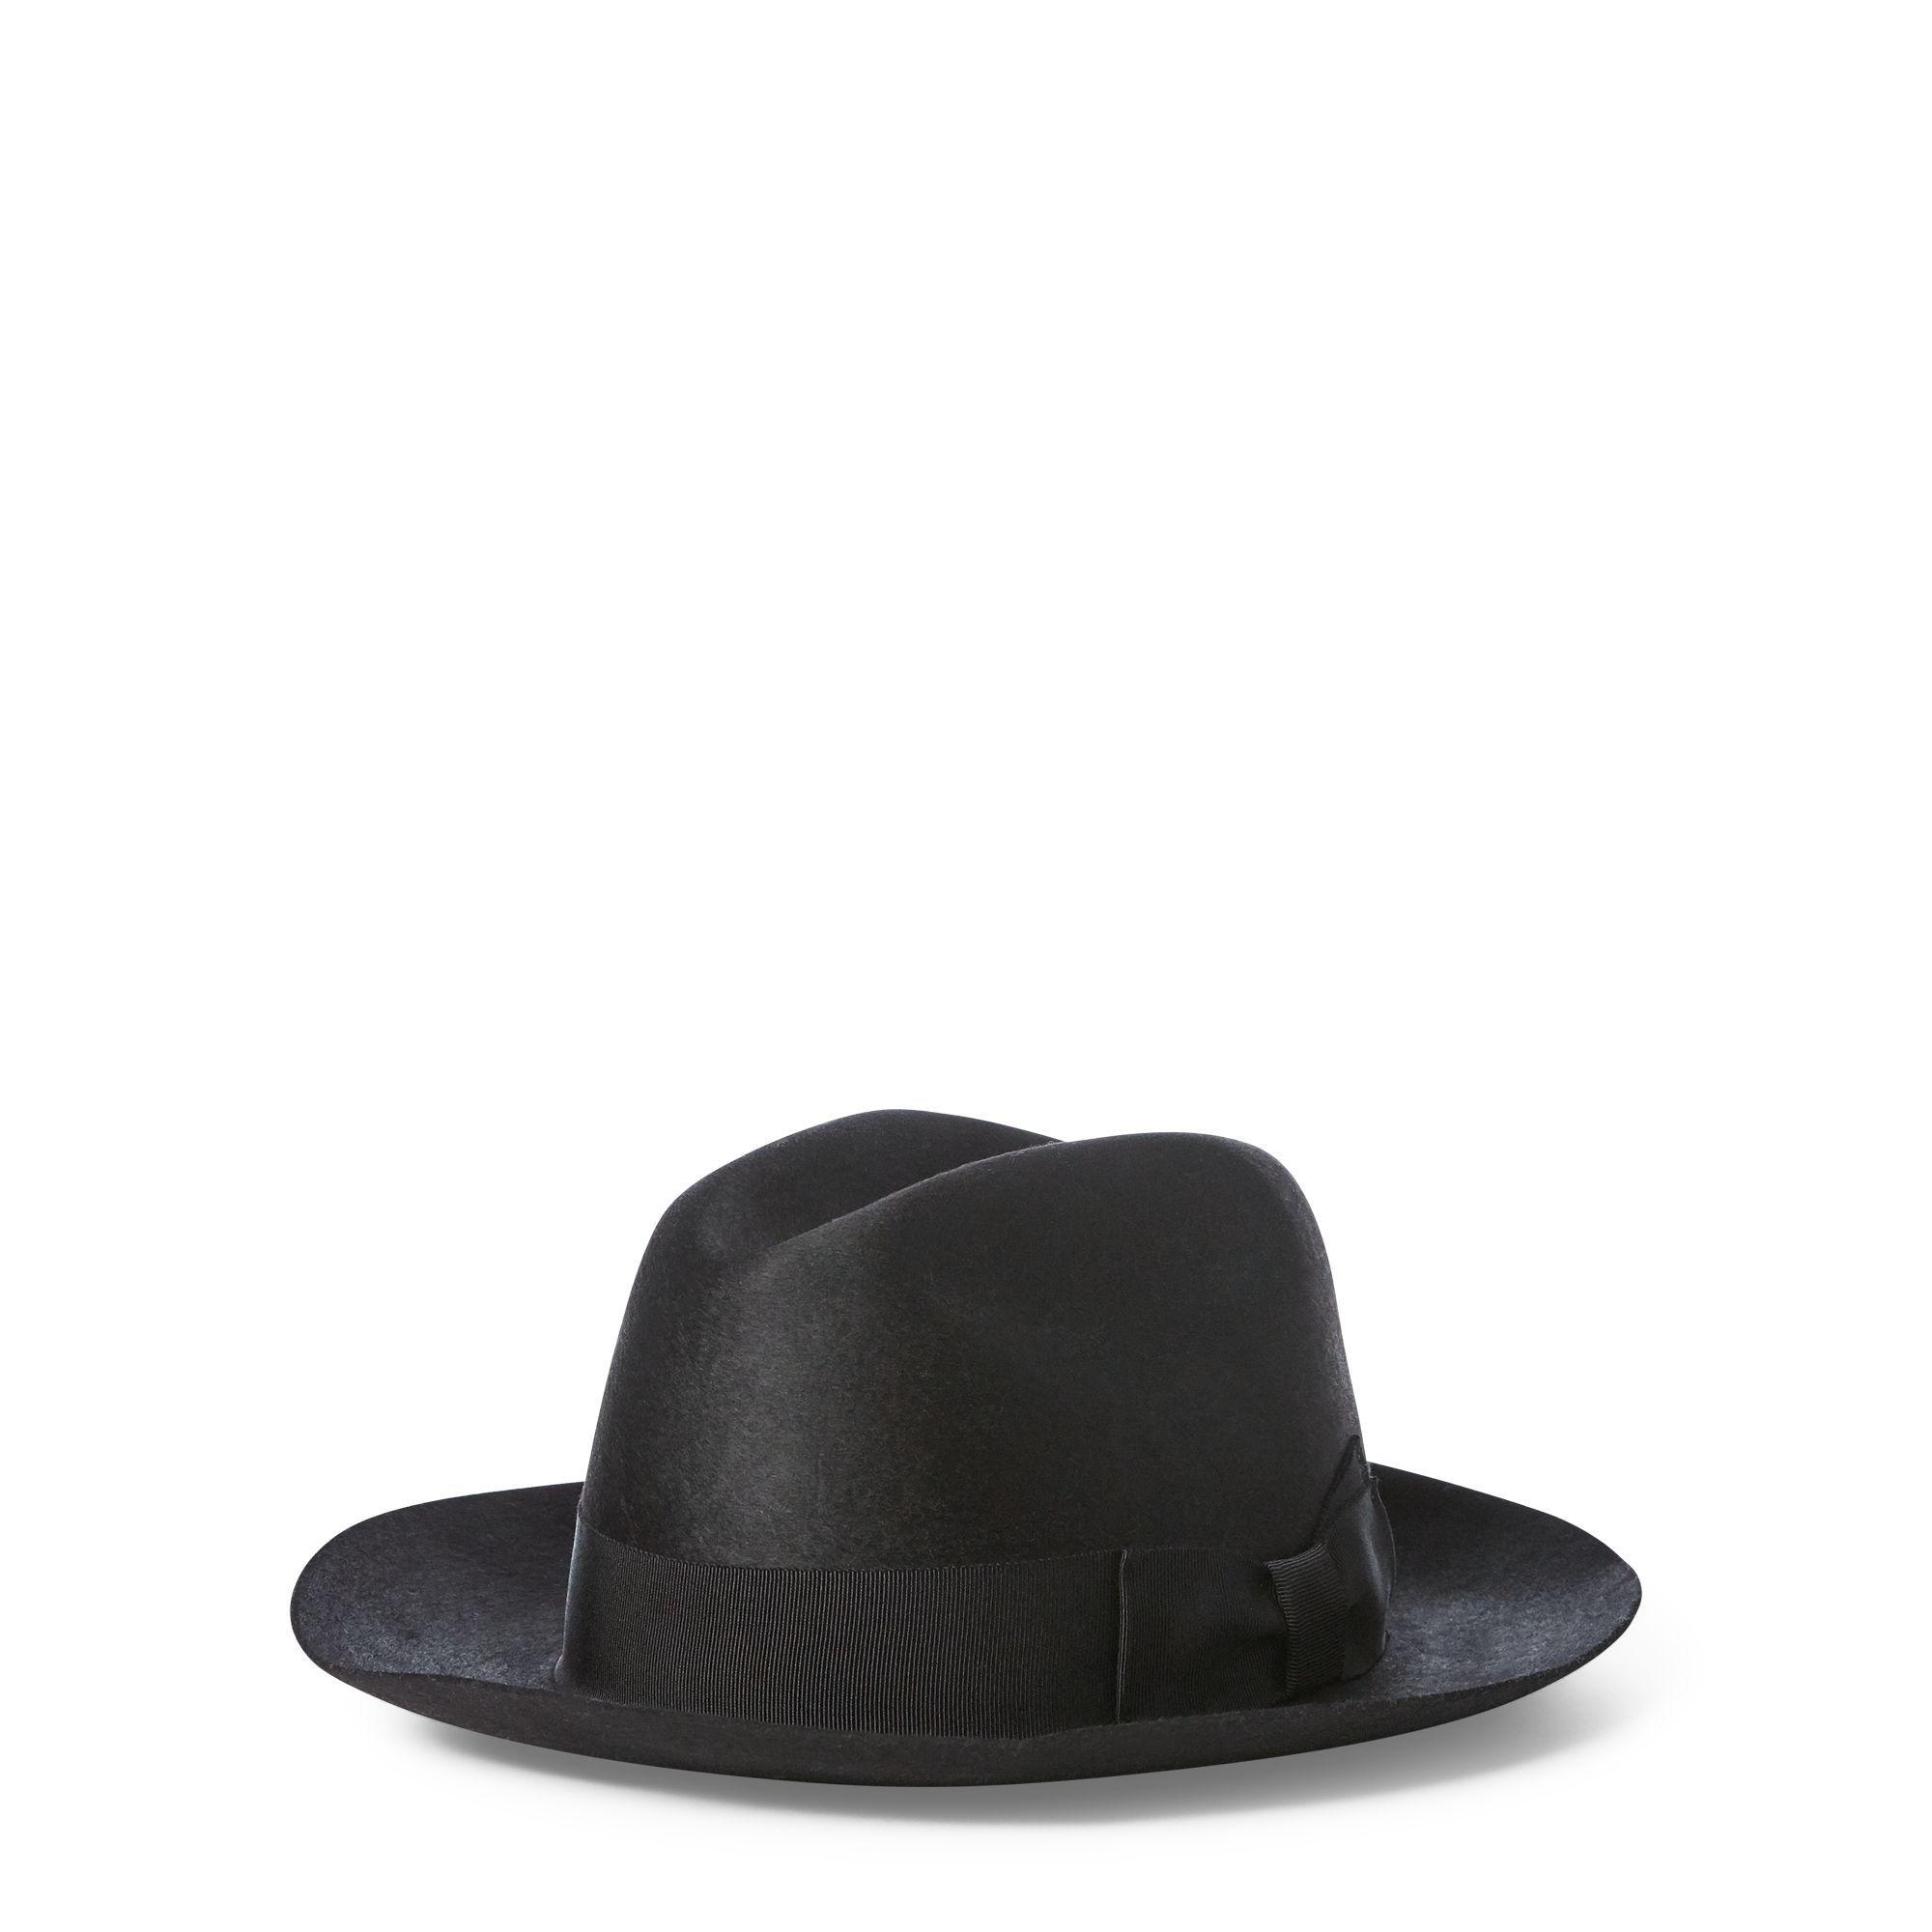 54e2b8c223e Lyst - Polo Ralph Lauren Wool Felt Fedora in Black - Save 39%